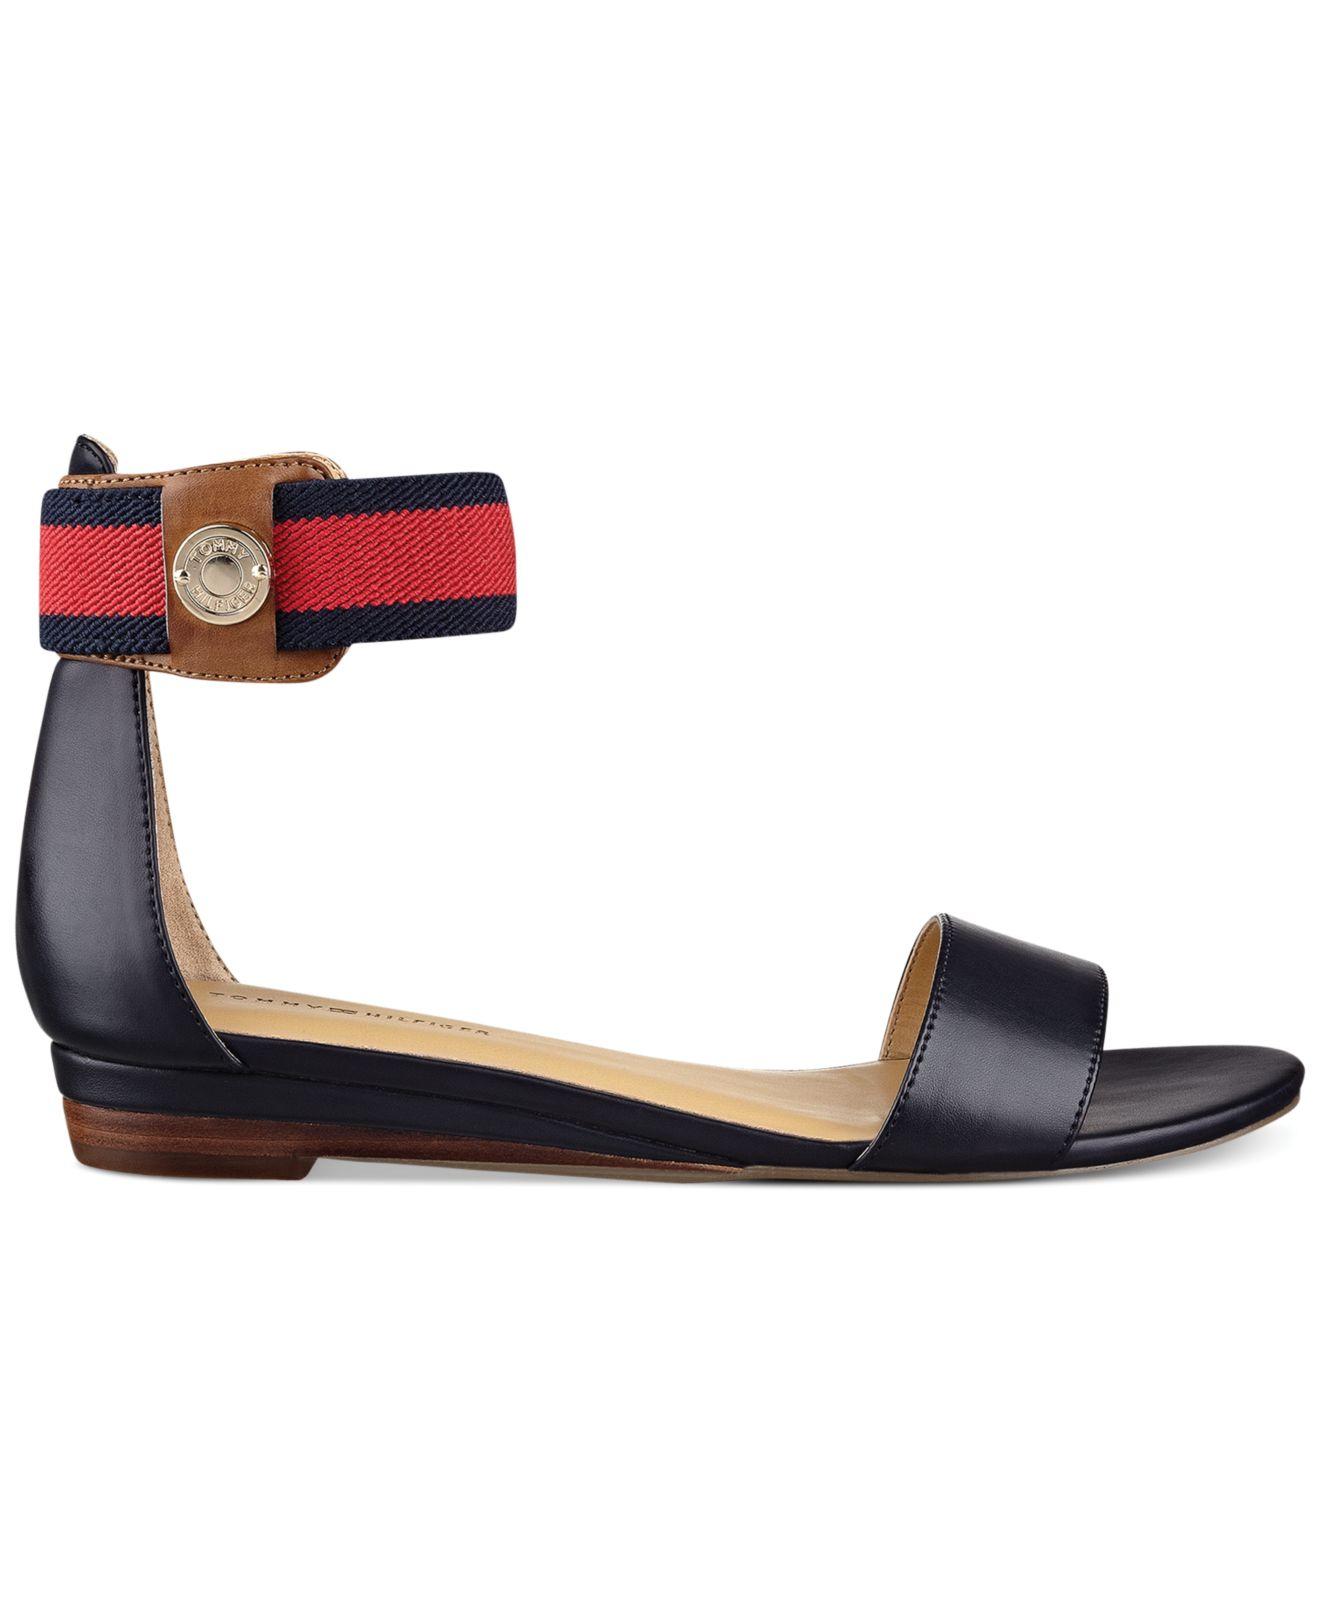 b517483fc Lyst · Tommy Hilfiger Dulce Slide Sandal · Tommy Hilfiger Women s Geena  Stretch Slingback Flat Sandals · Spring s Hottest Sales ...